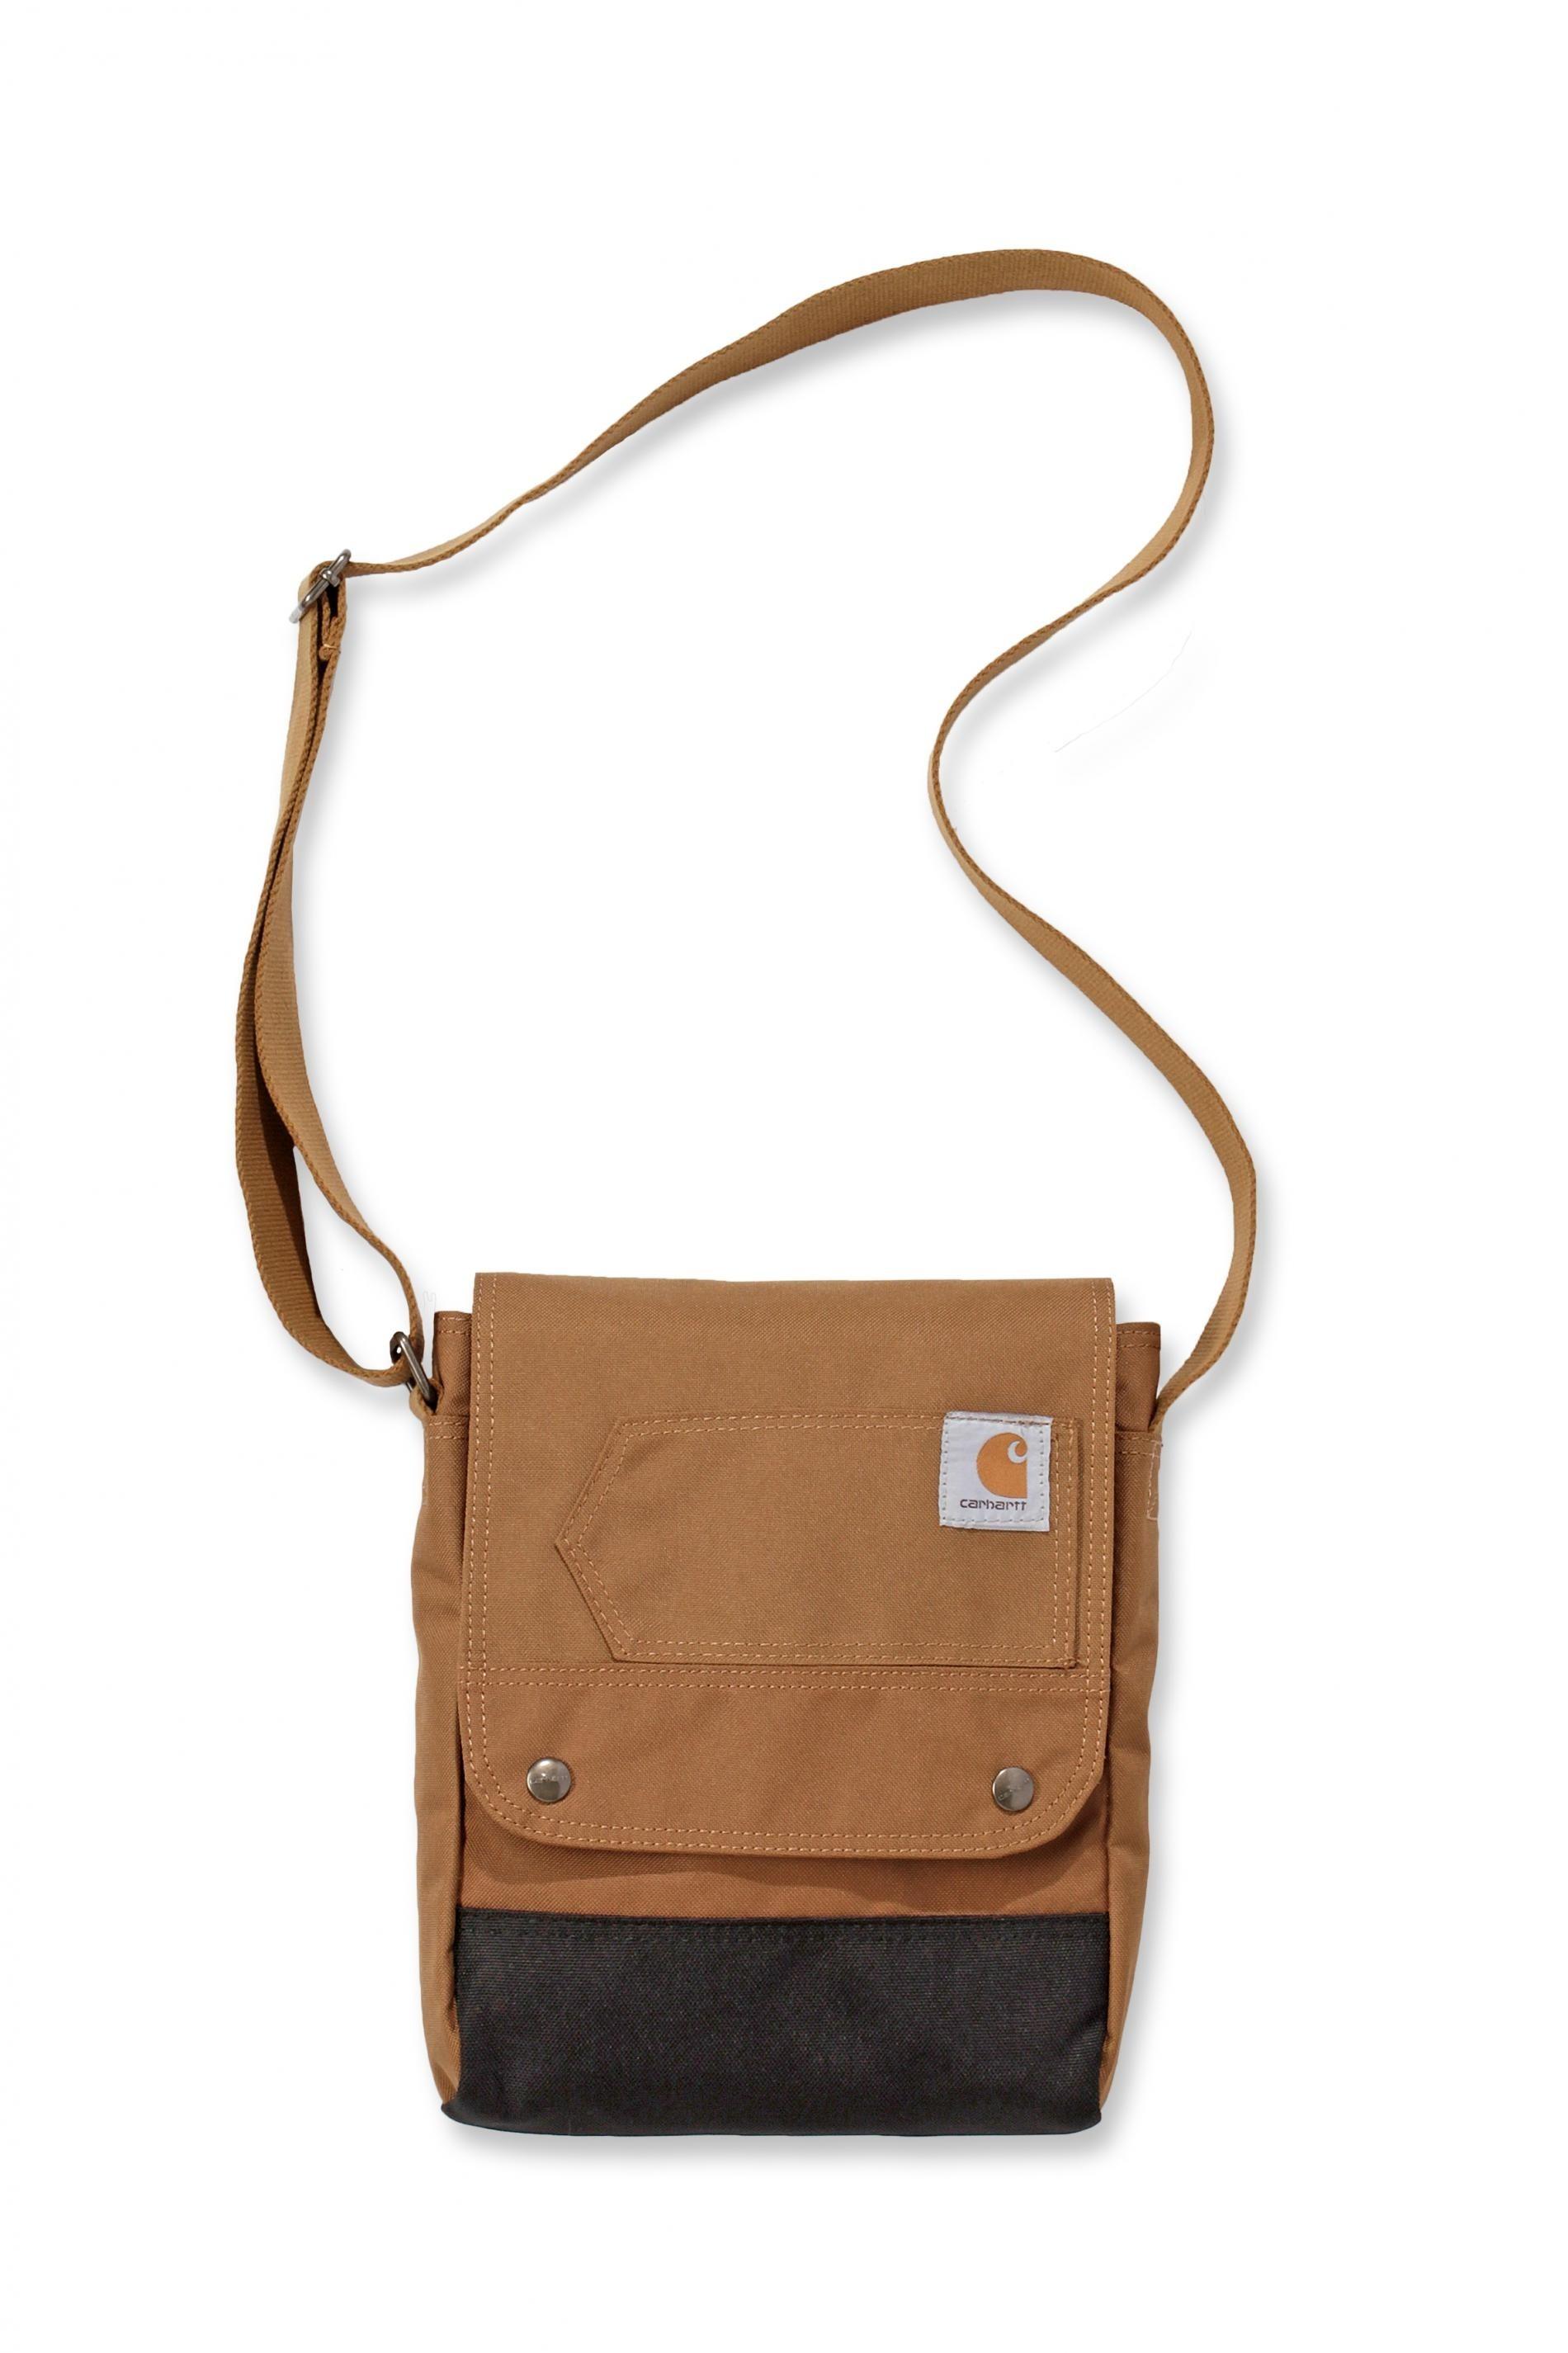 Carhartt CrossBody Bag-Carhartt Brown